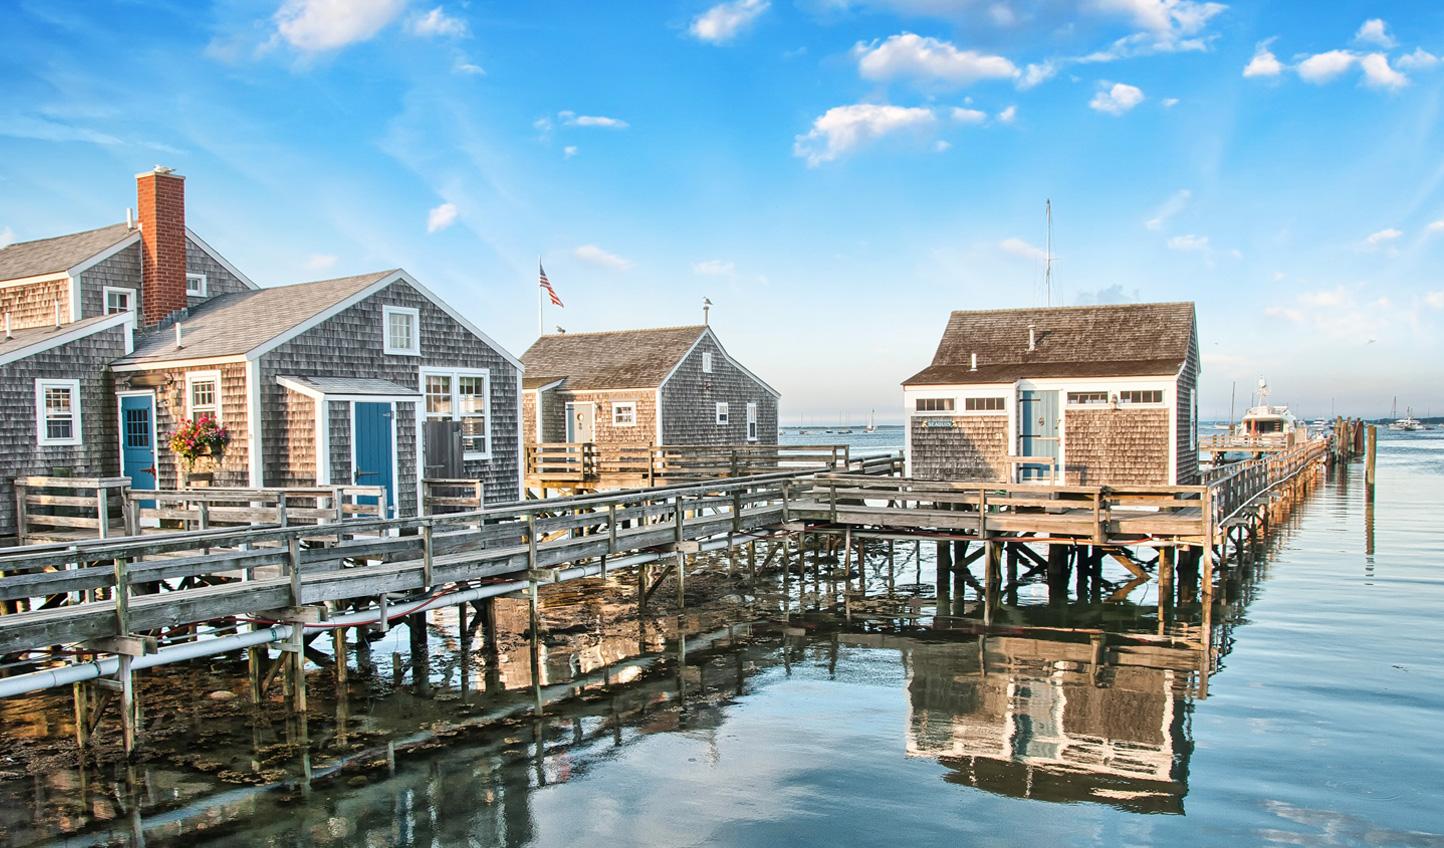 Take a walk along the quaint pier of Nantucket Island